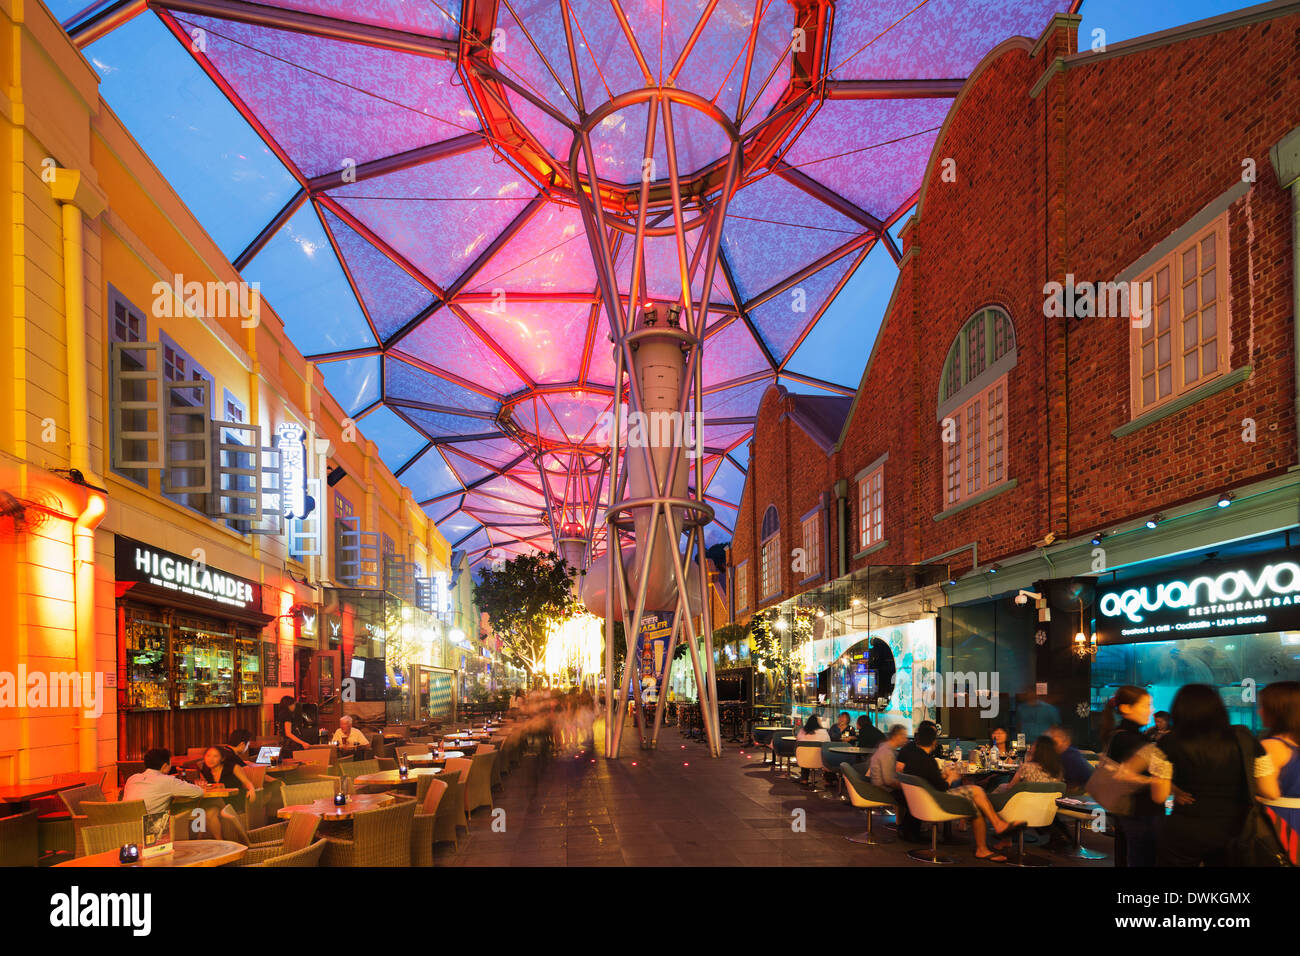 Nachtleben, Clarke Quay, Singapur, Südostasien, Asien Stockbild